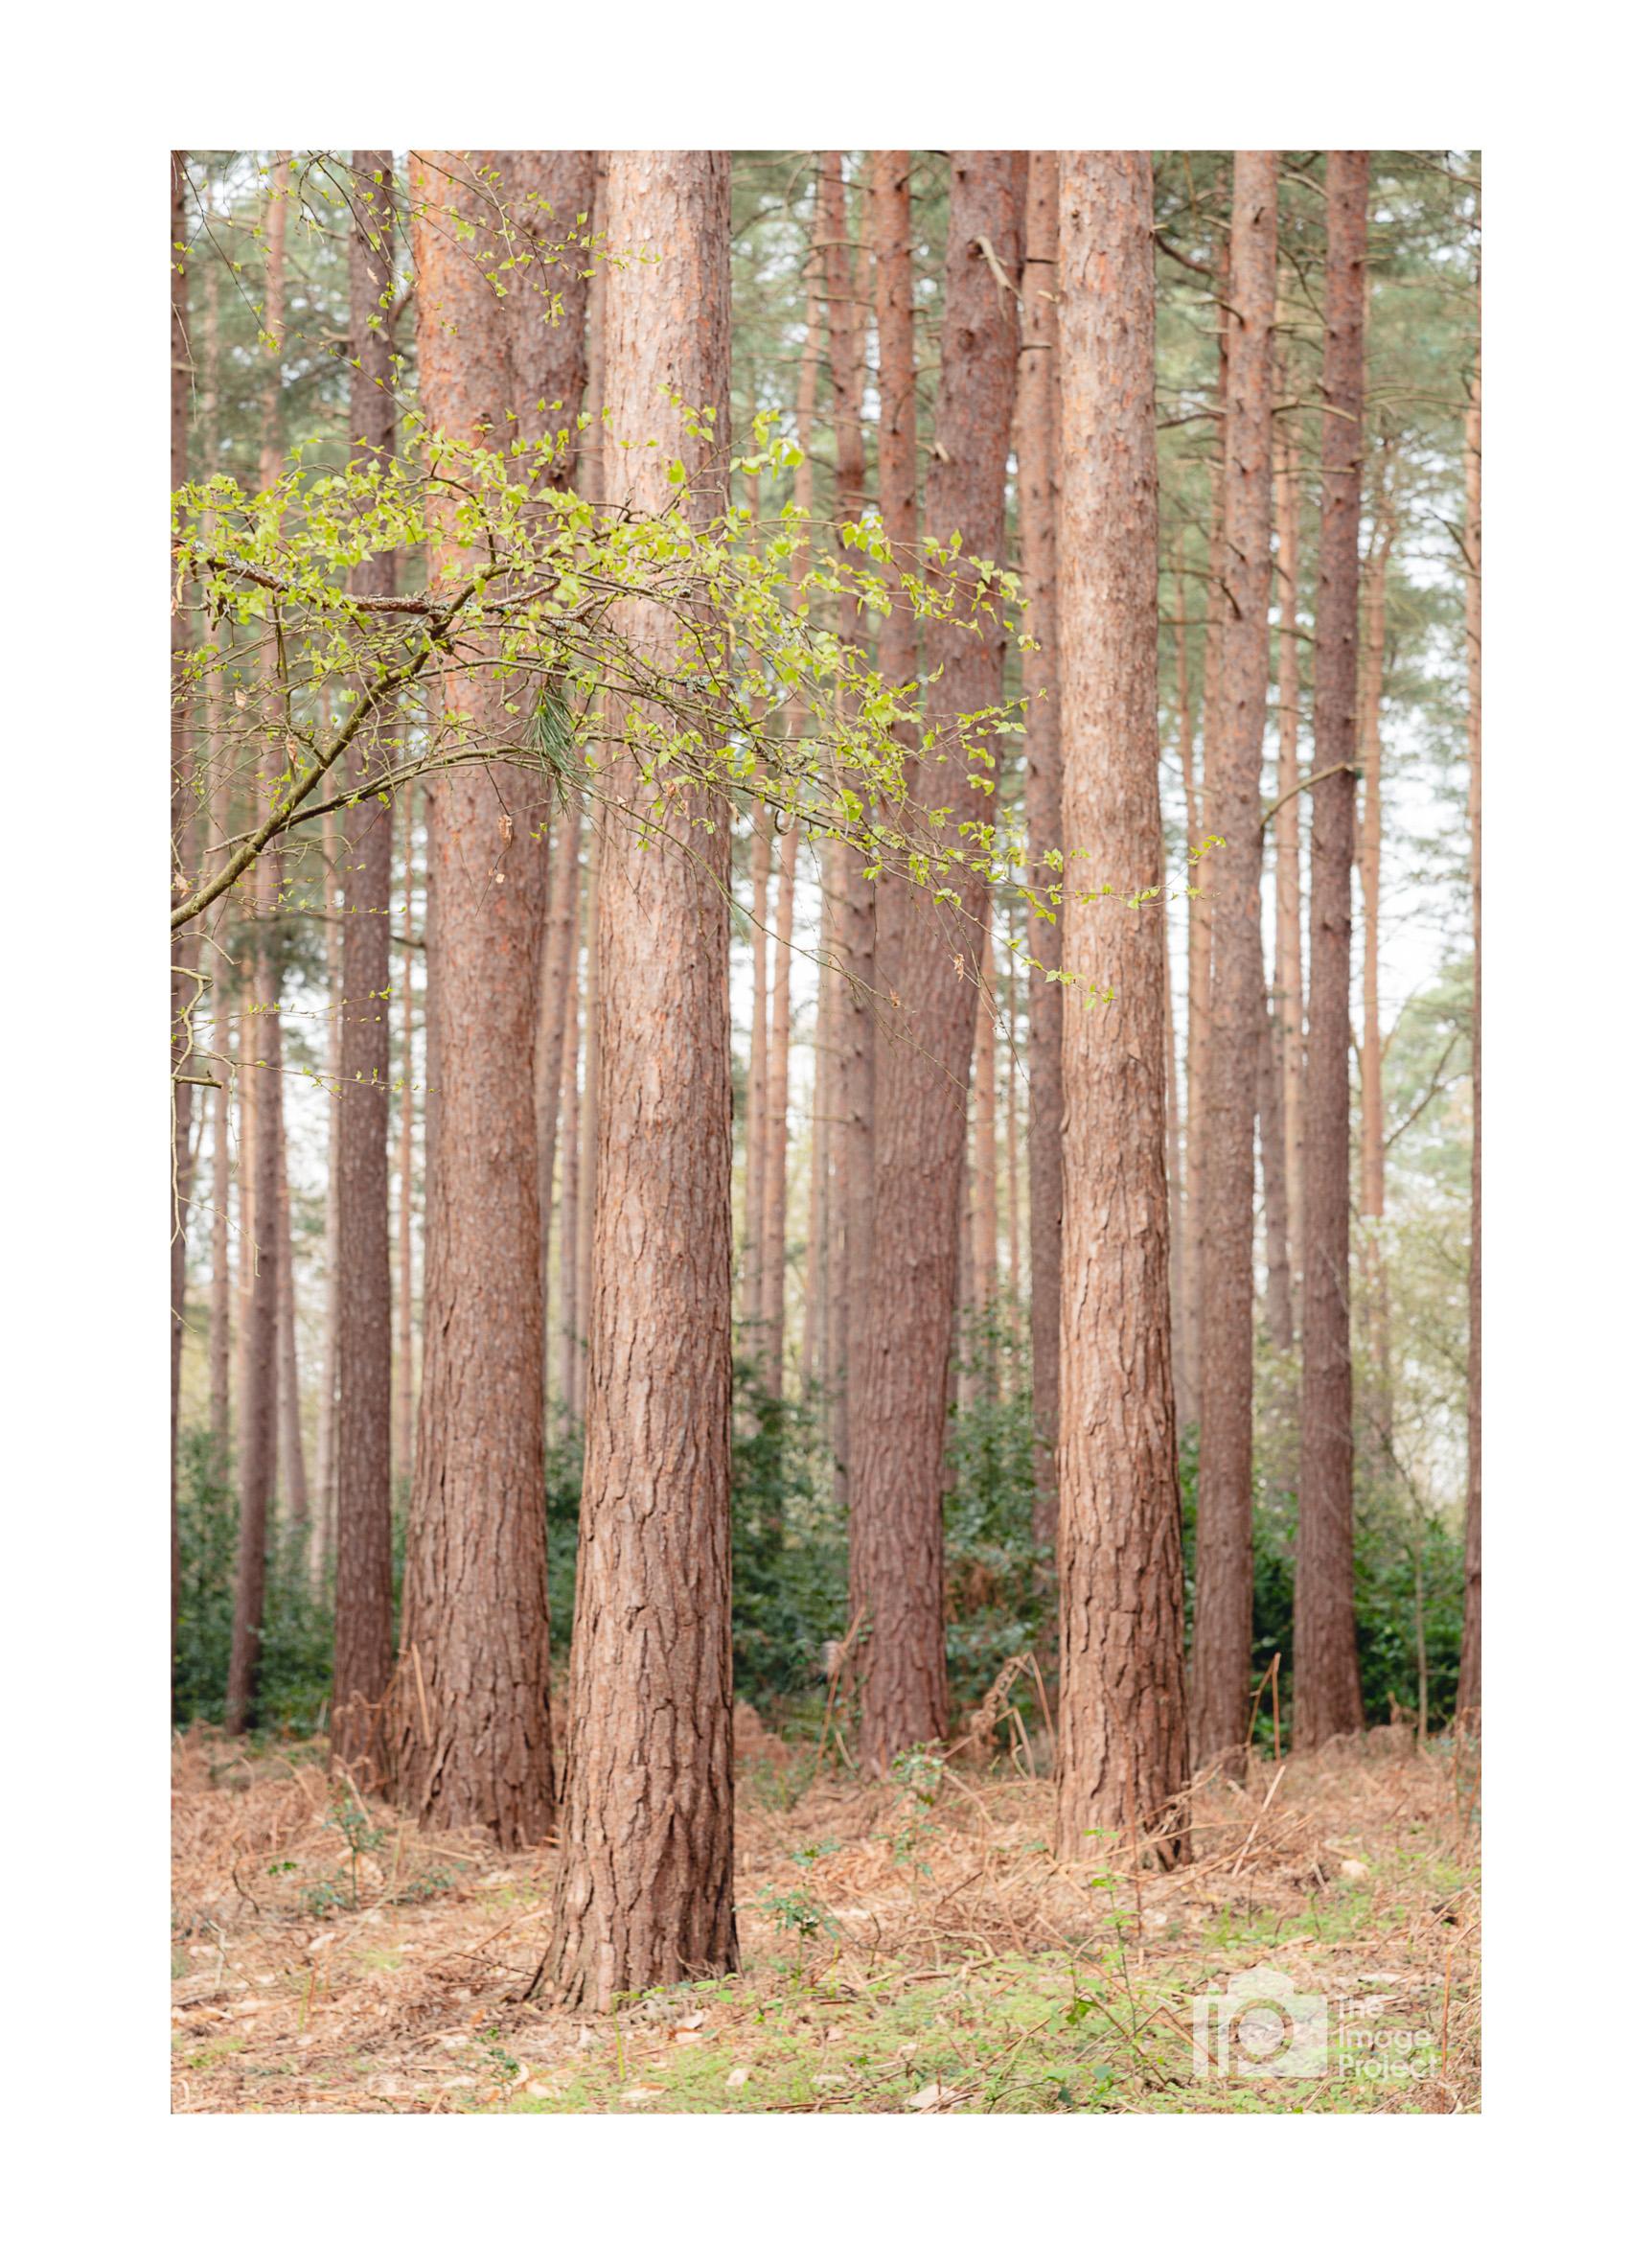 Windsor trees 6 apr 2019.jpg